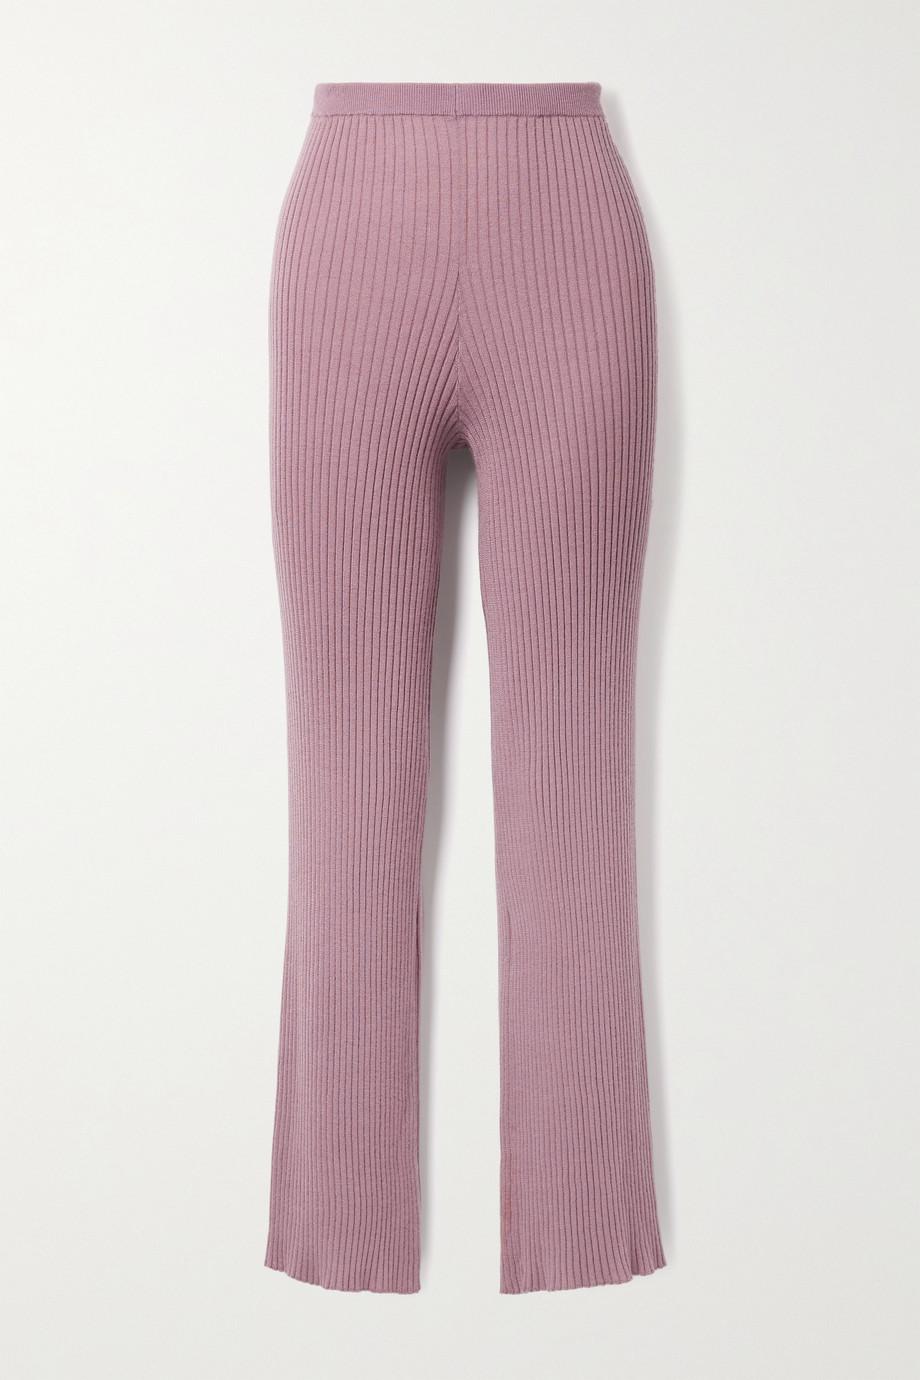 Sablyn Jordan ribbed cashmere straight-leg pants